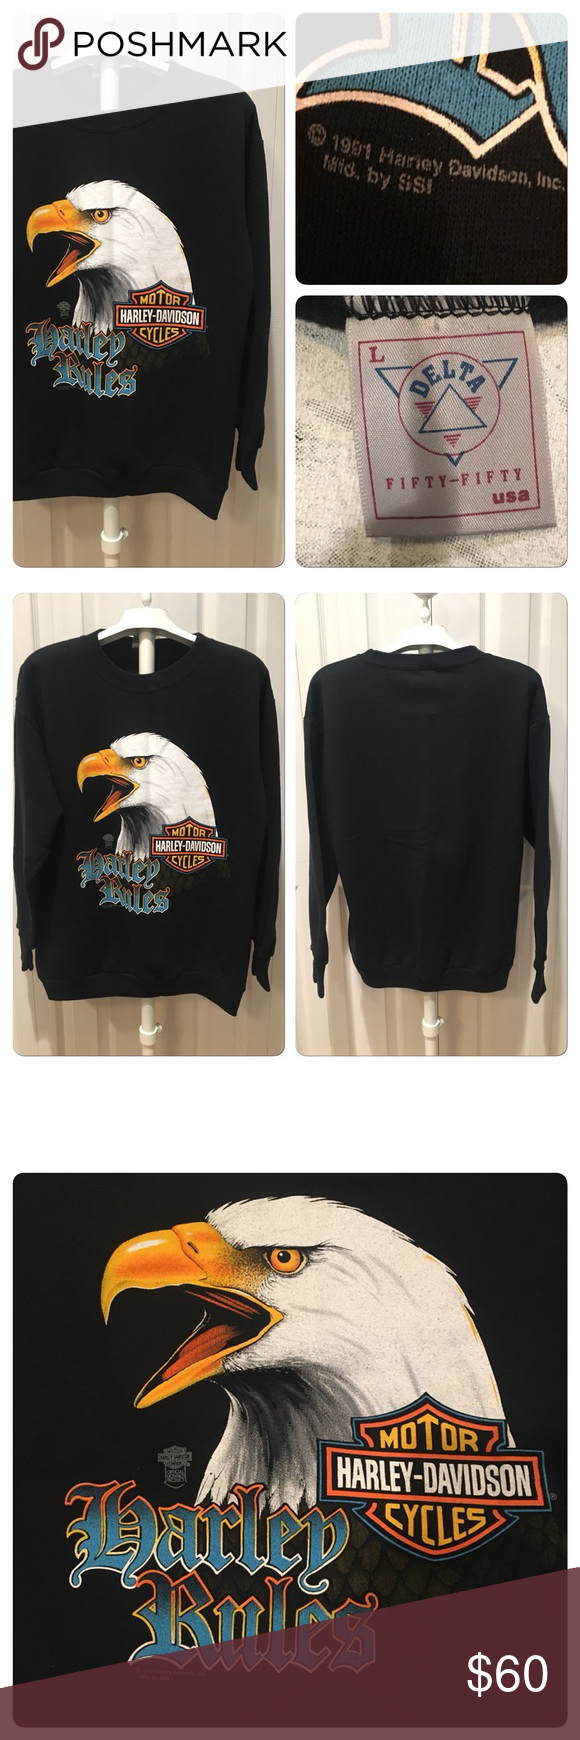 Vintage 1991 Harley Eagle sweatshirt Vintage 1991 Harley Davidson Sweatshirt  in Black Printed on a Delta a793b5e08